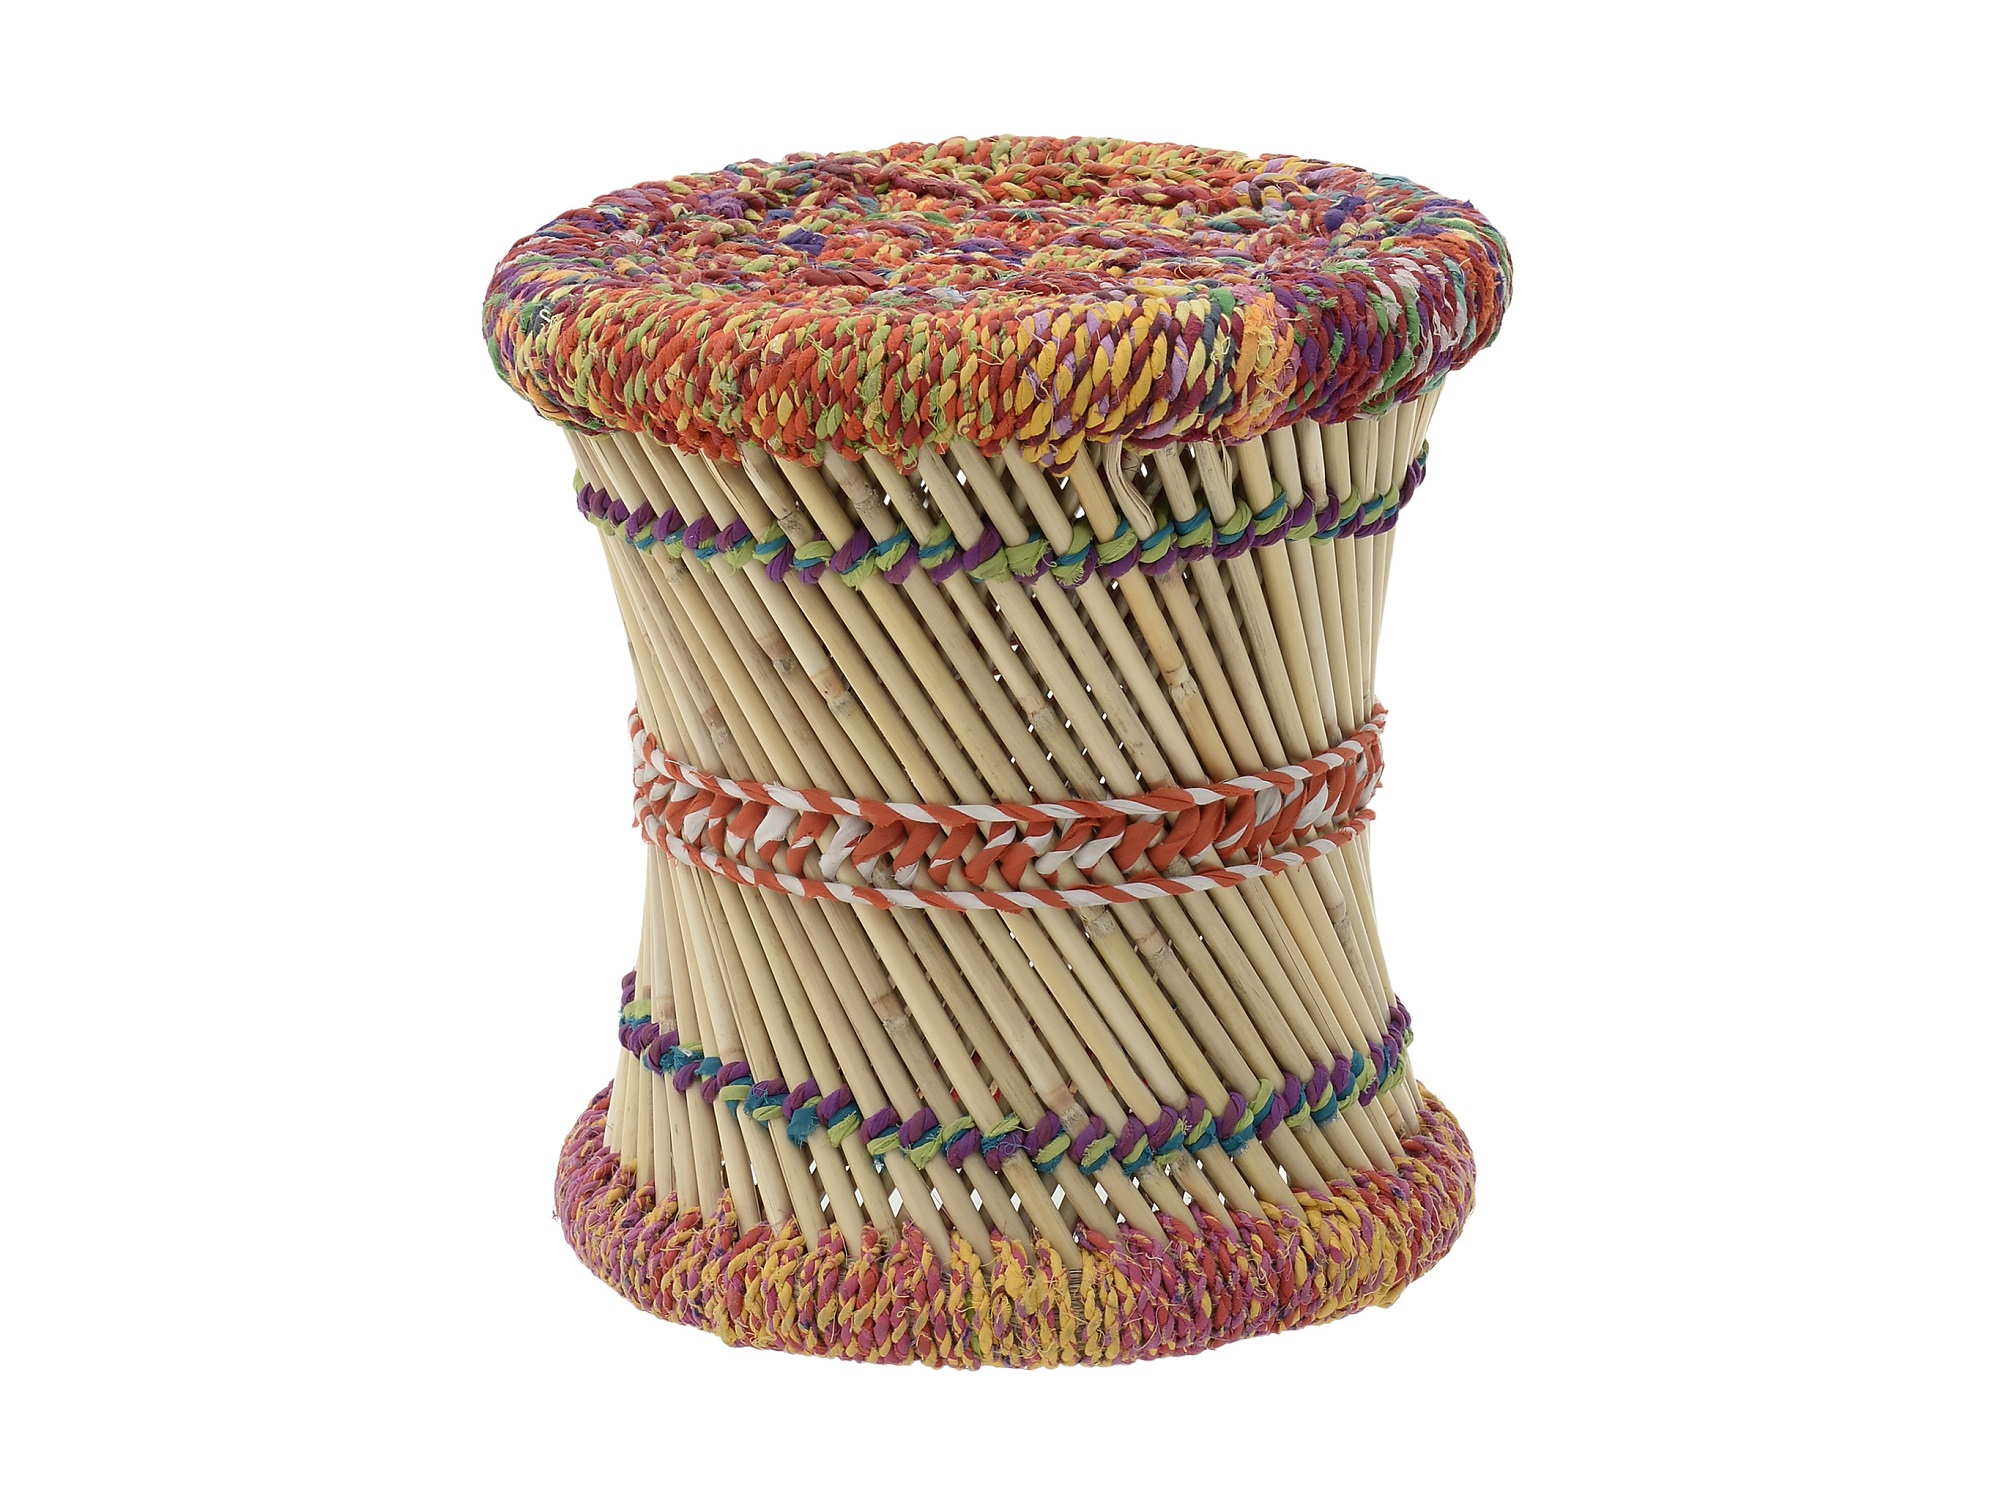 Табурет JourdainТабуреты<br><br><br>Material: Текстиль<br>Ширина см: 36.0<br>Высота см: 38.0<br>Глубина см: 36.0